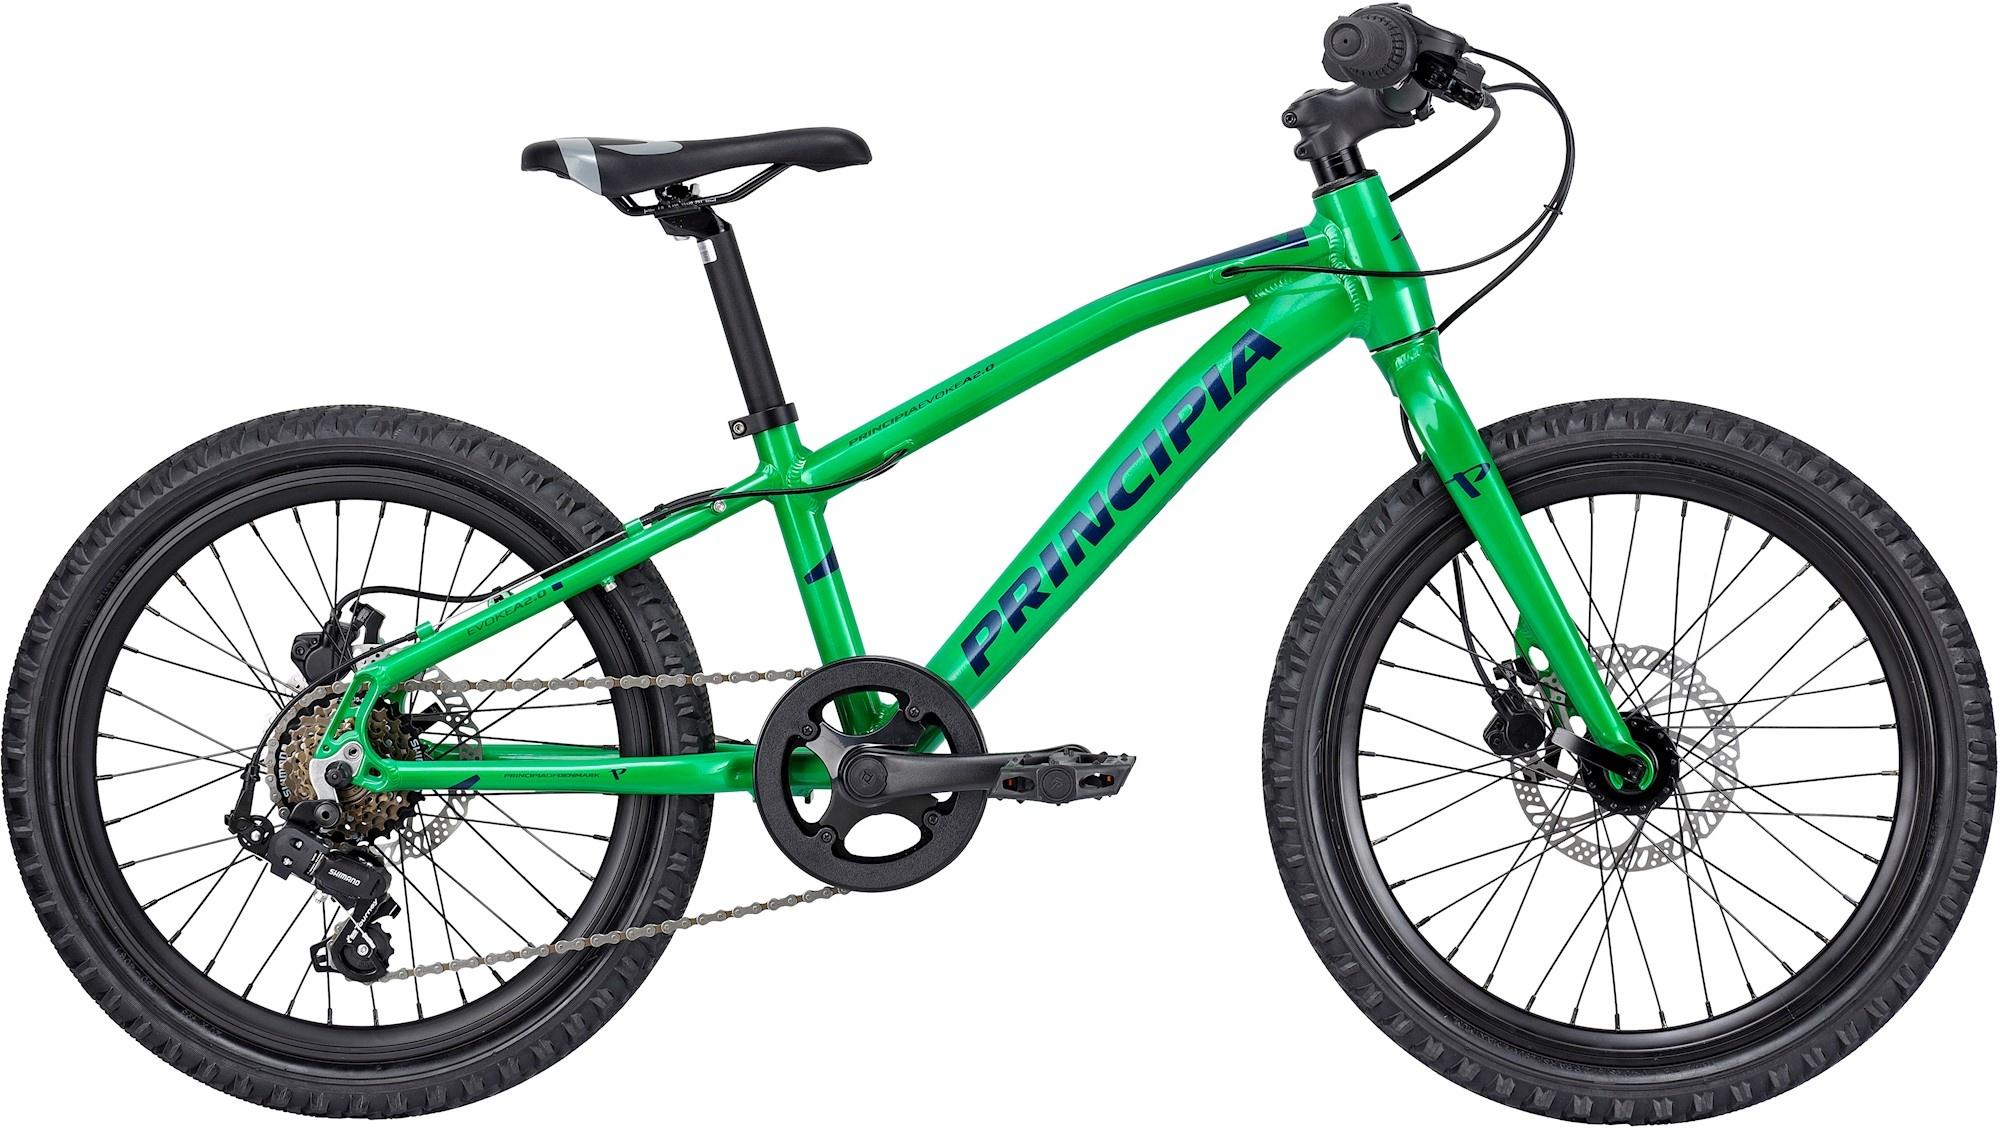 "Principia Principia Evoke A2.0 20"" 2021 - Grøn Cykler > Børnecykler"